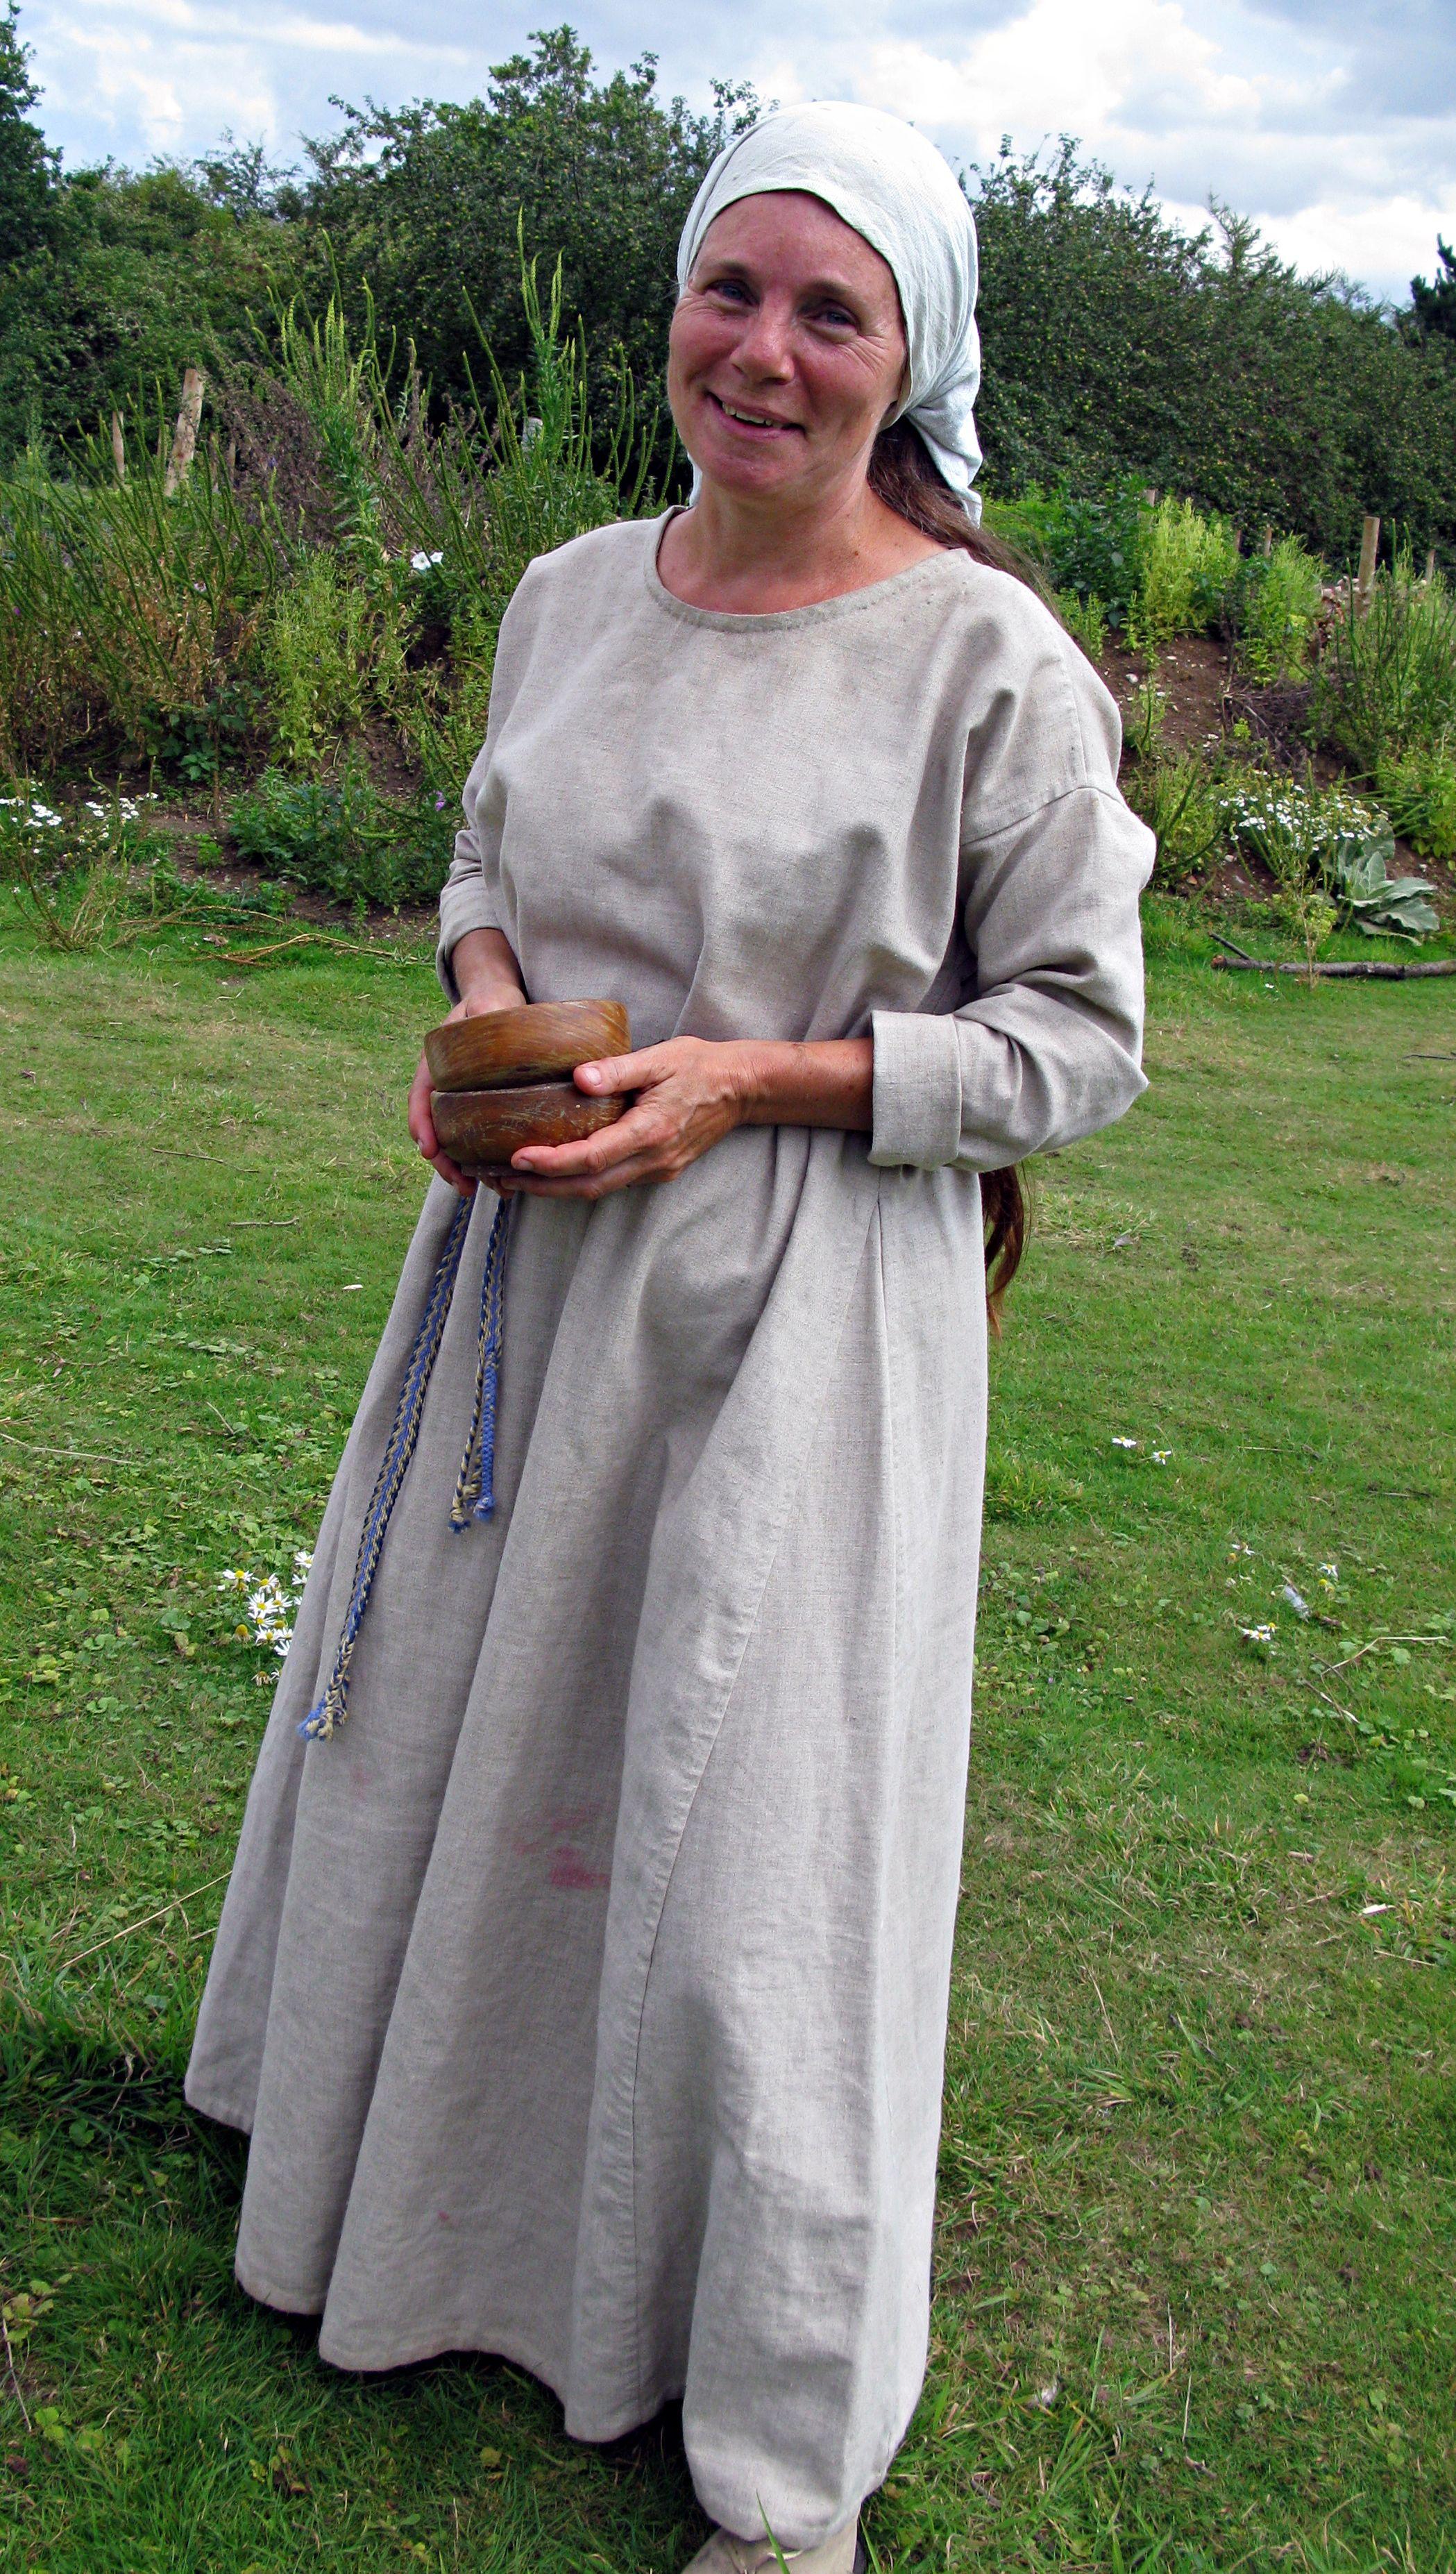 c4f1c2a161 Anglo Saxon costume